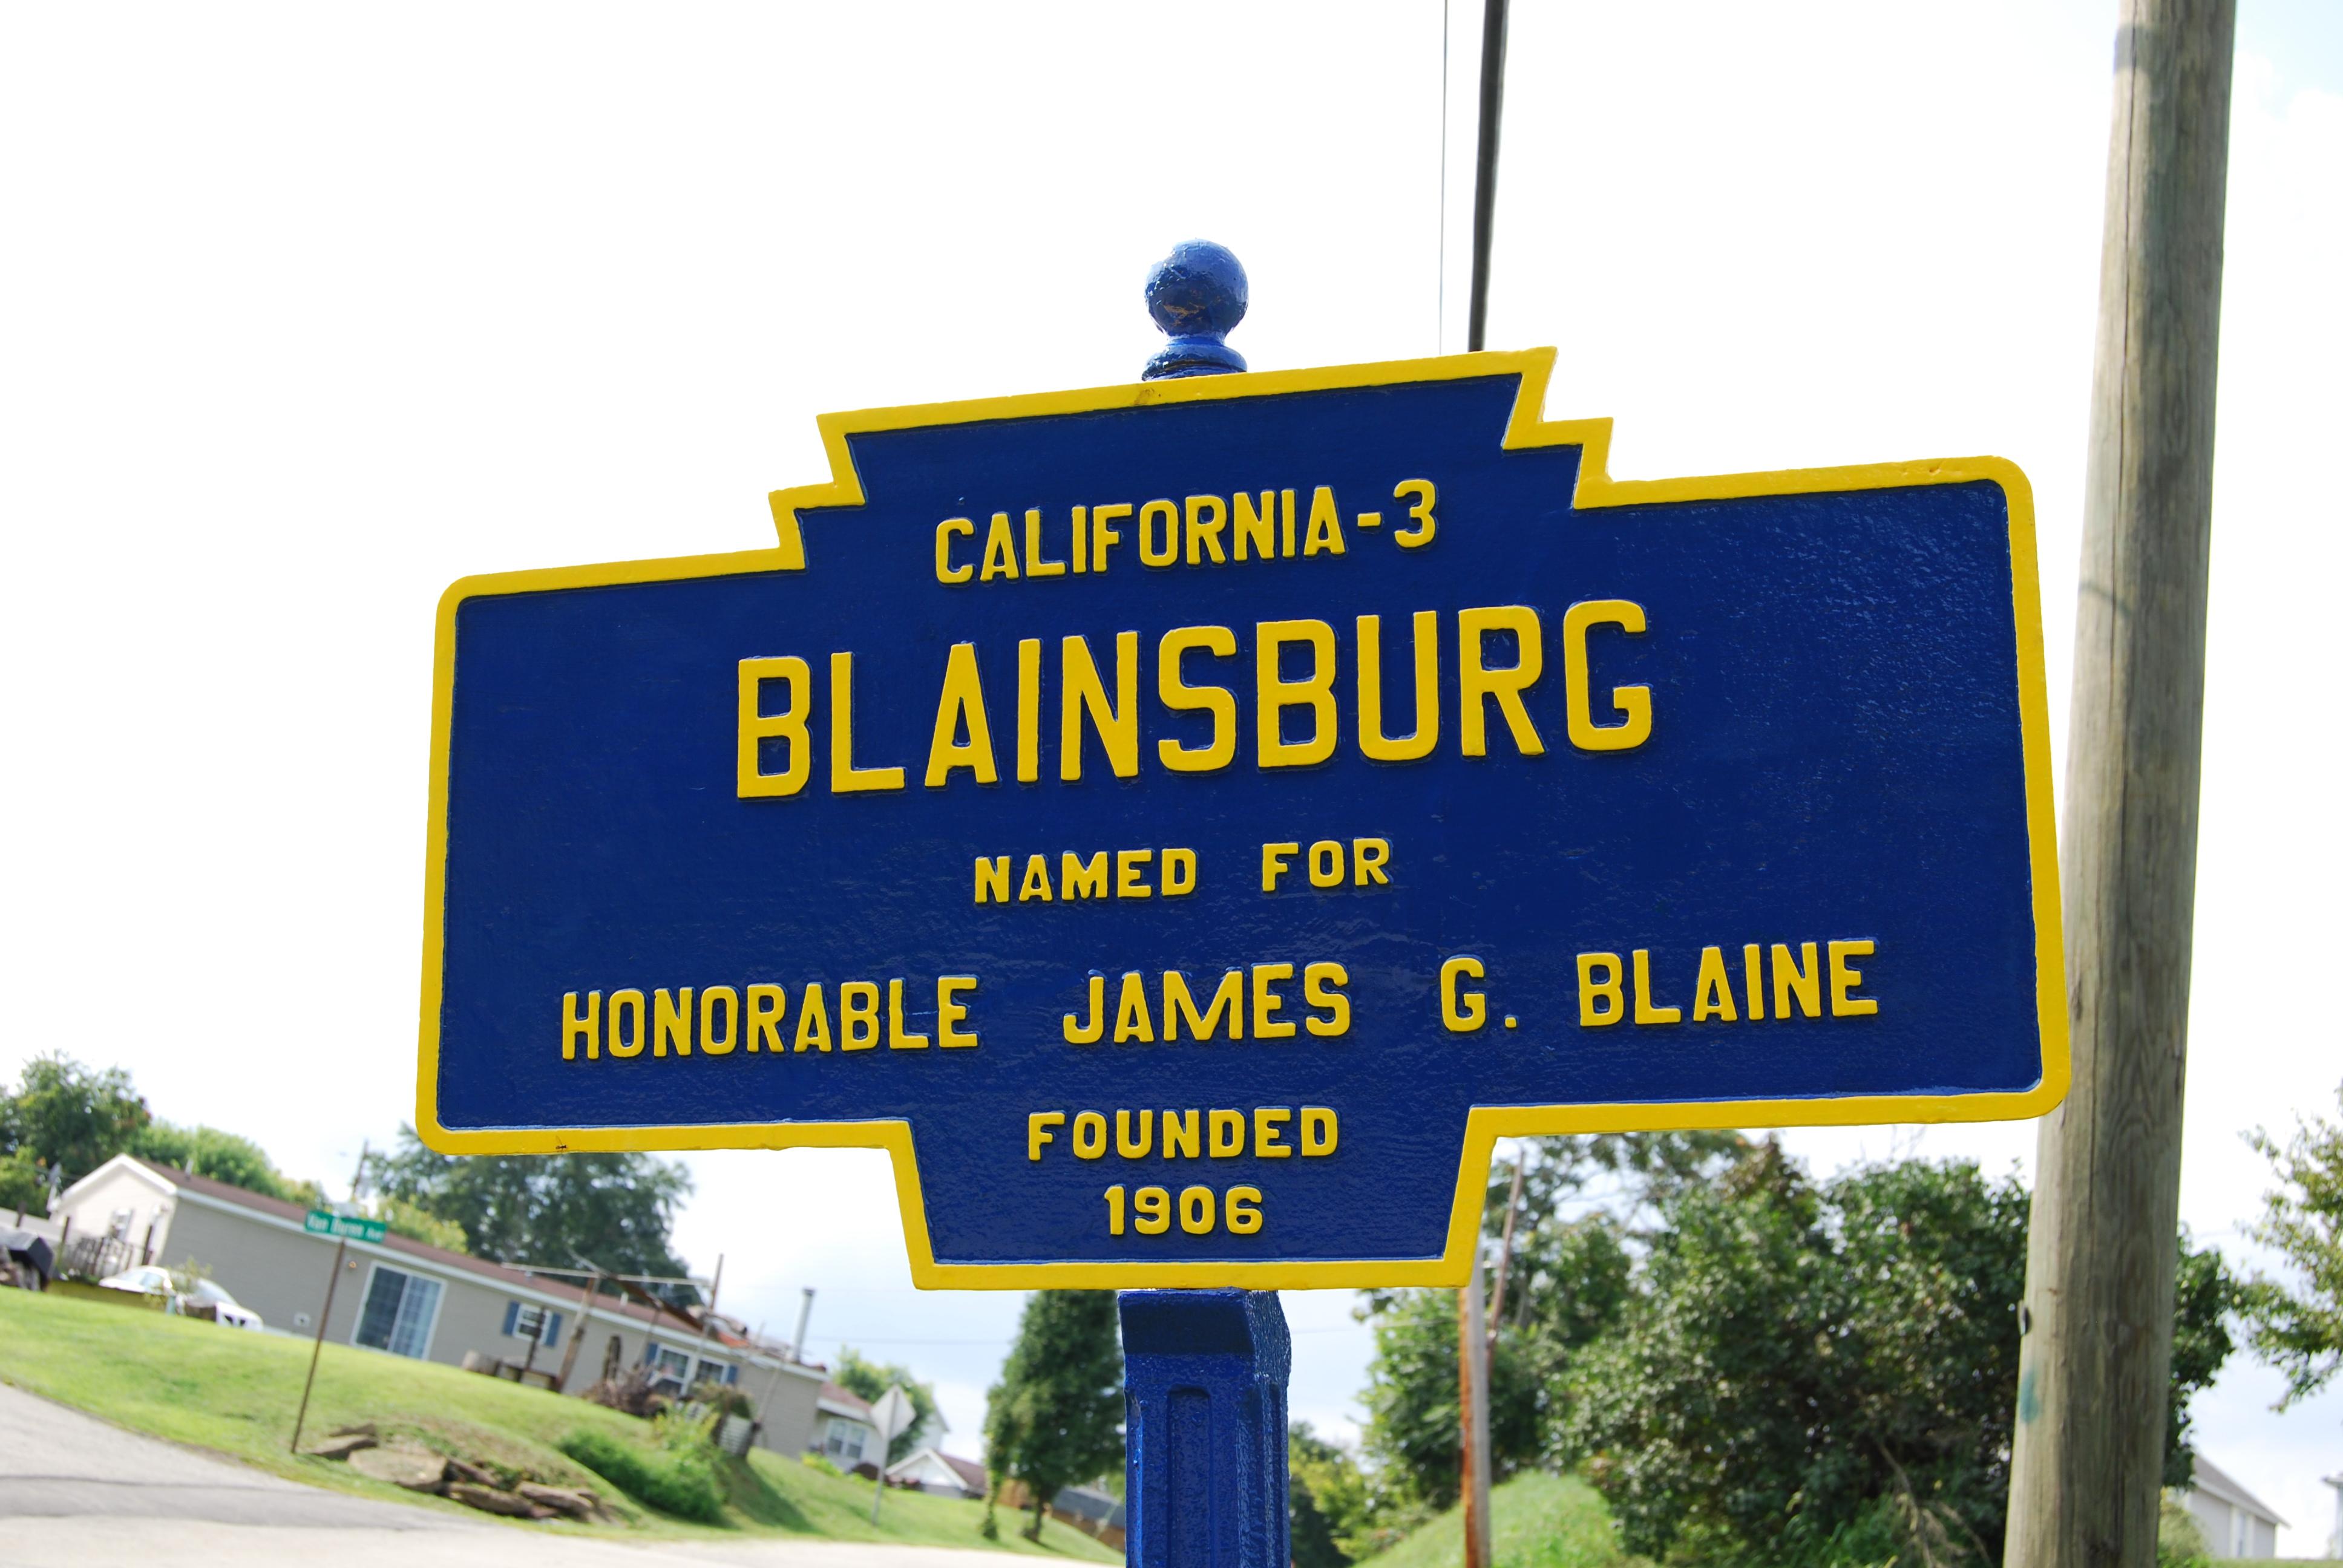 town-blainsburg-california-0817mwintermantel-42